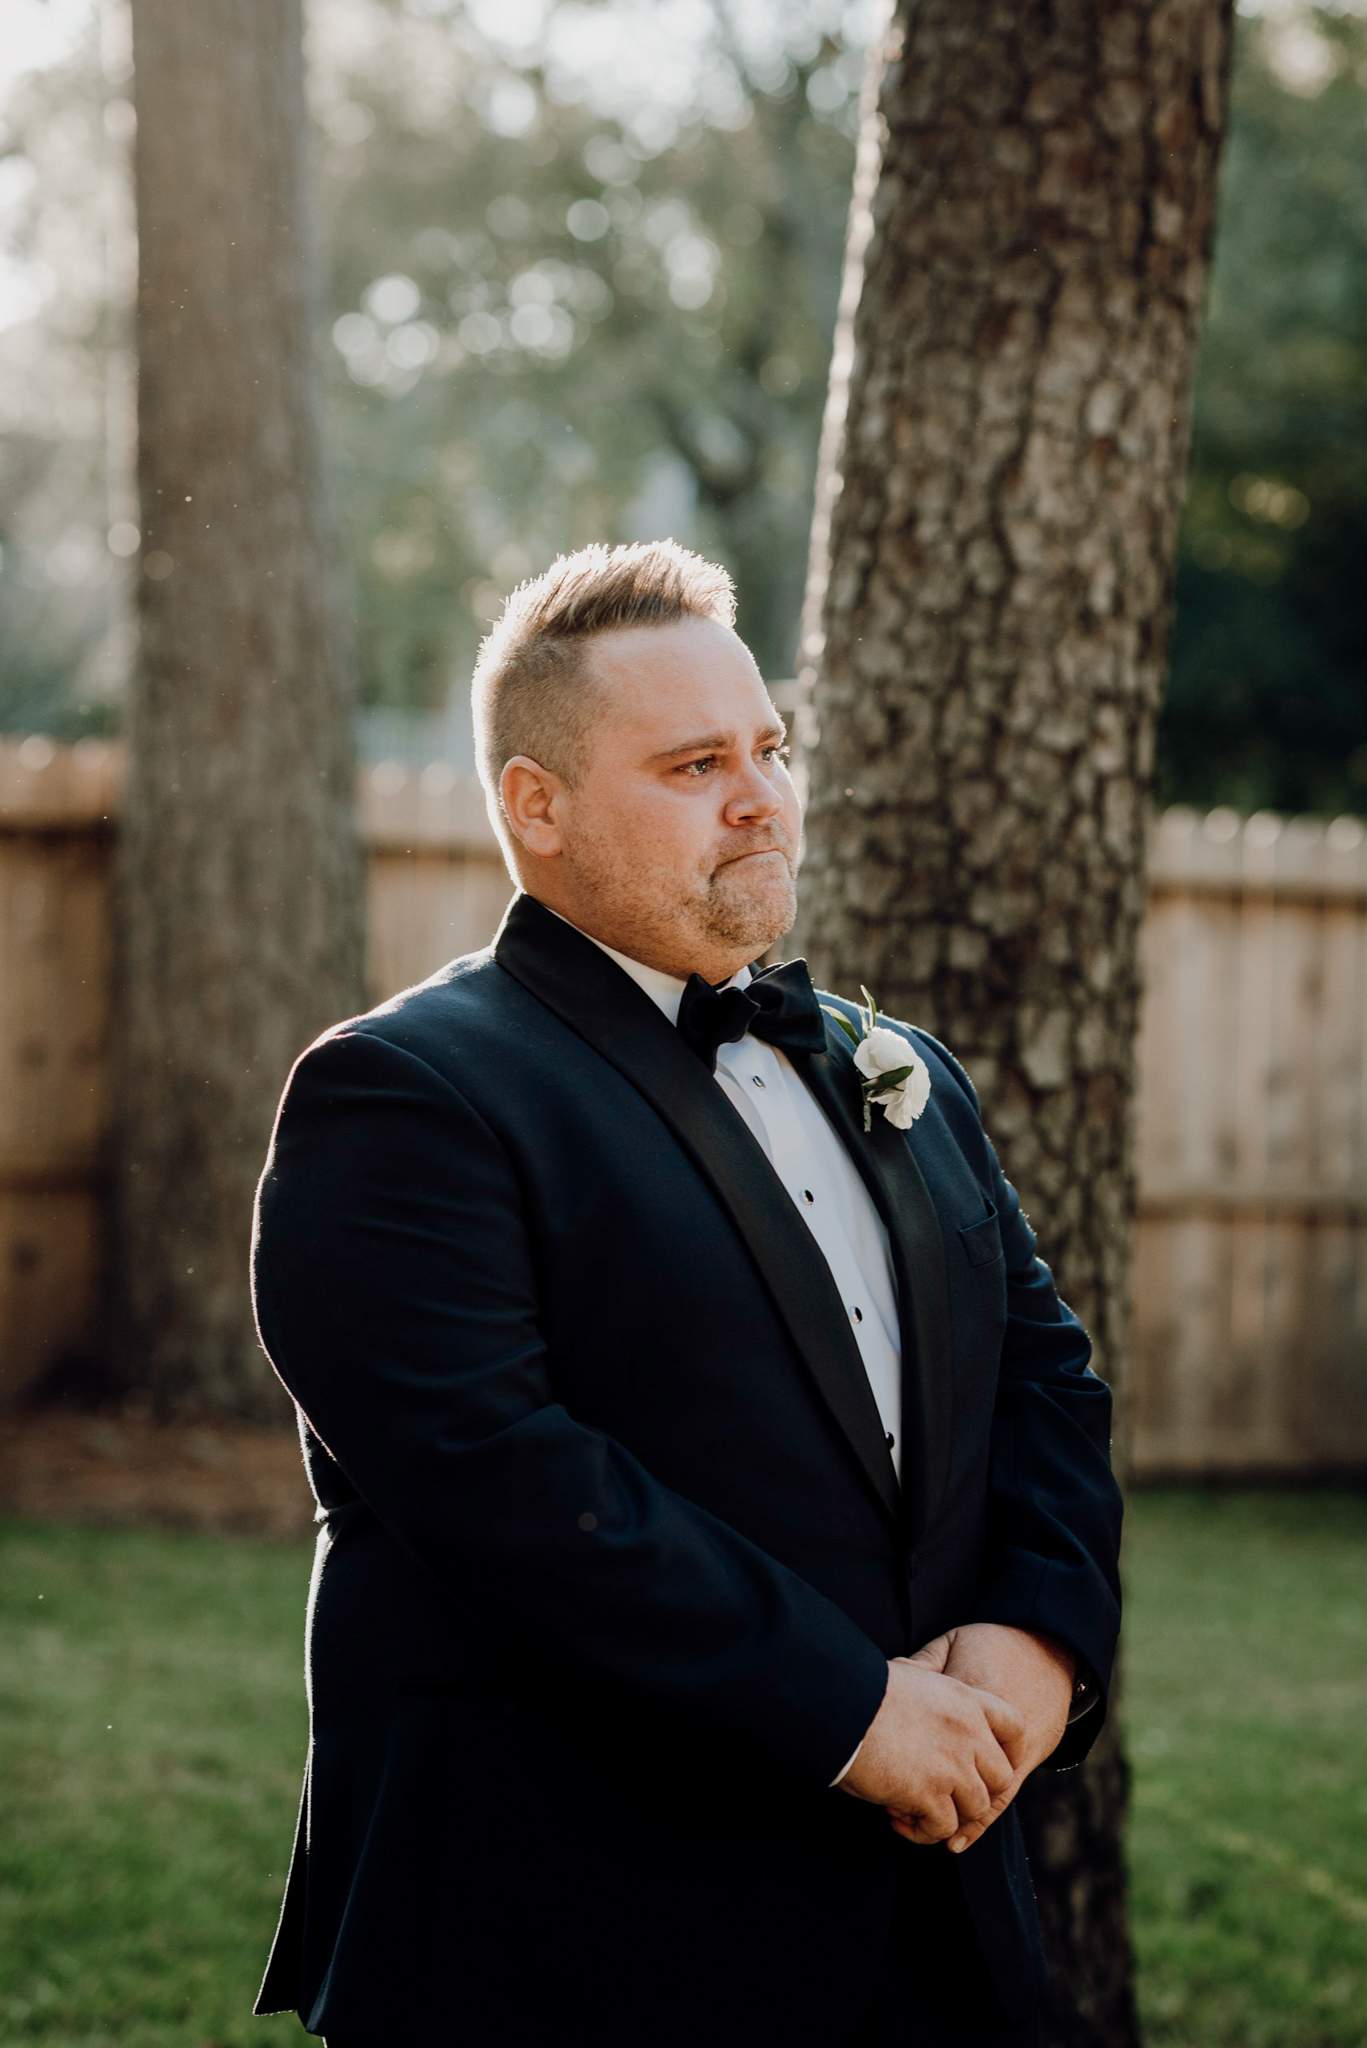 Houston Wedding Photographer-Intimate Texas Backyard Wedding- Houston Wedding Photographer -Kristen Giles Photography-40.jpg